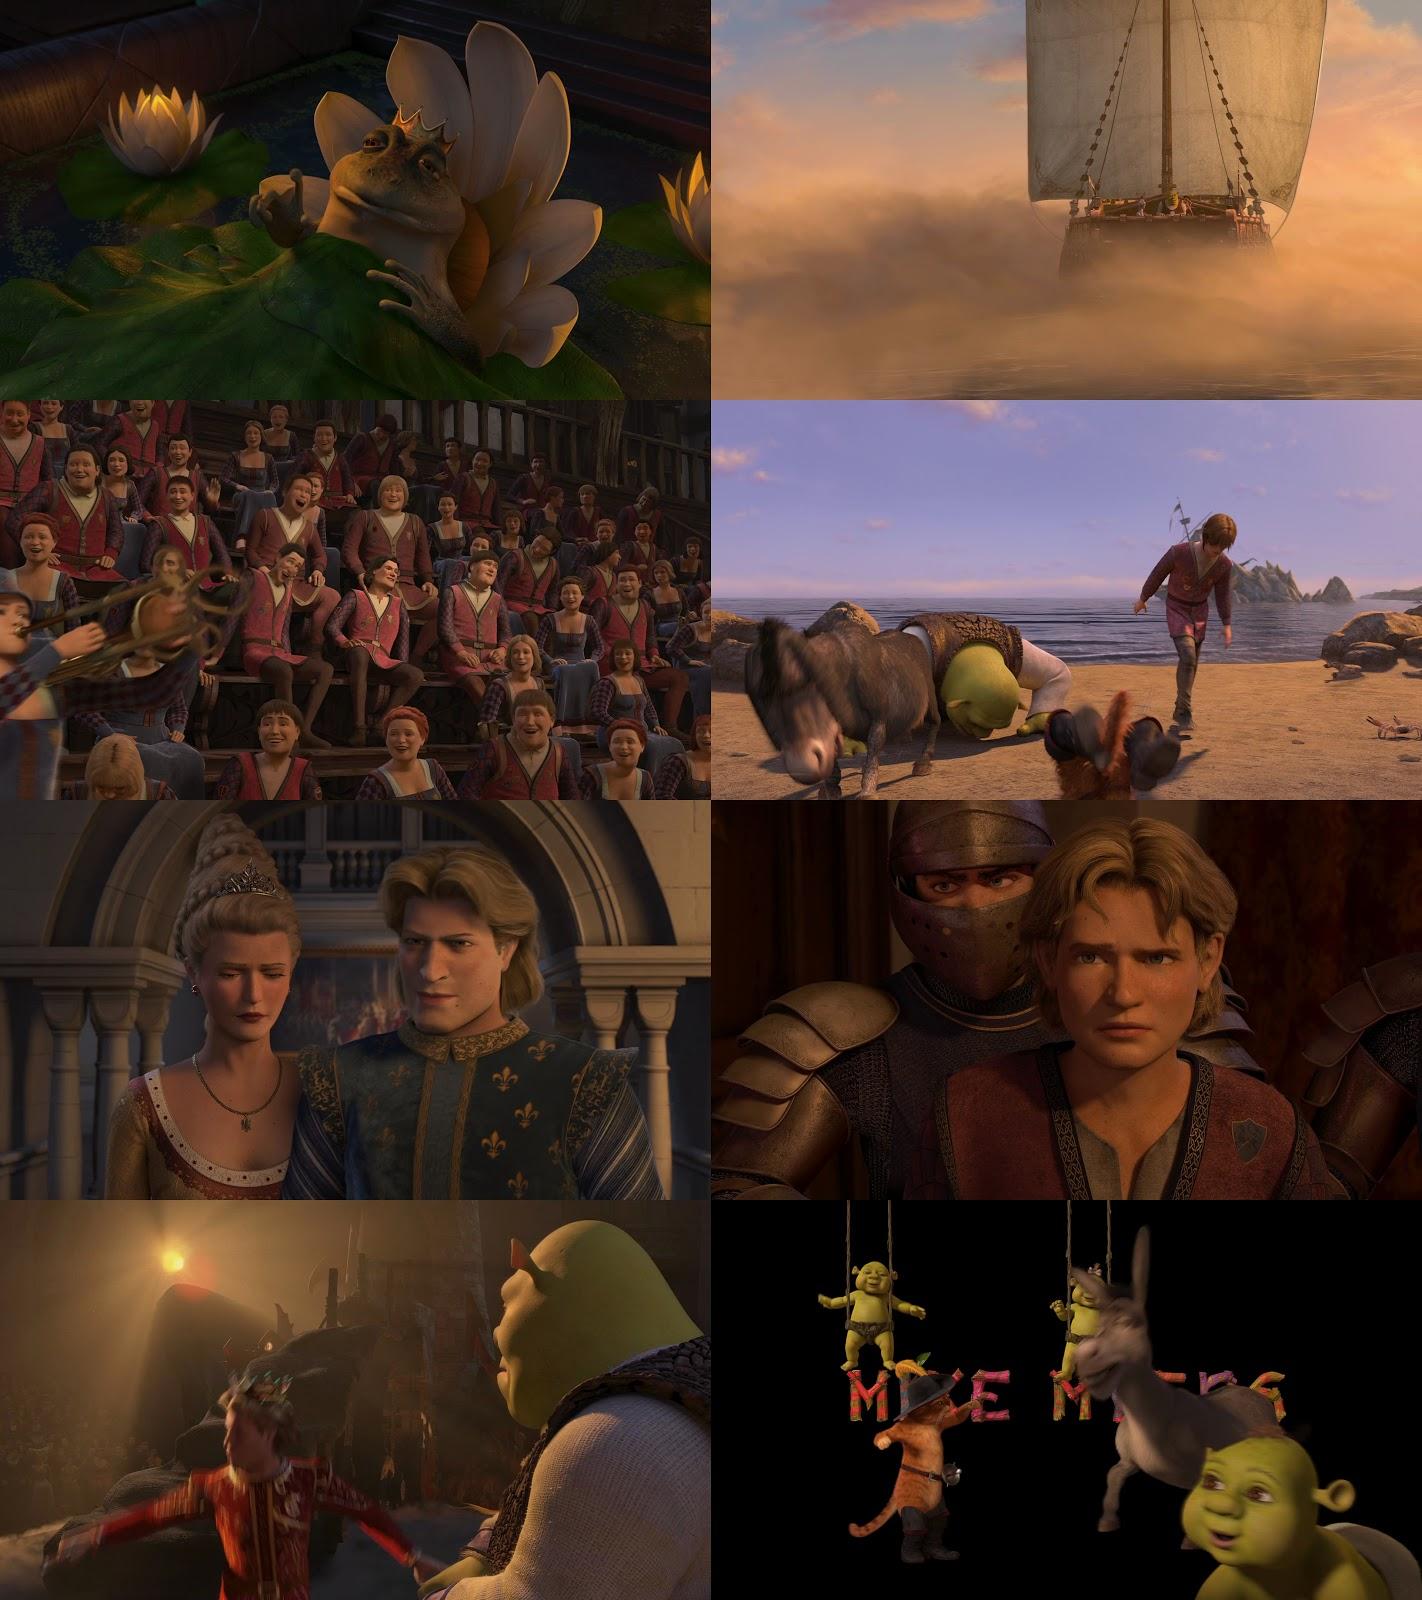 Shrek 3 [1080p] [Latino-Ingles] [MEGA] - MegaPeliculasRip